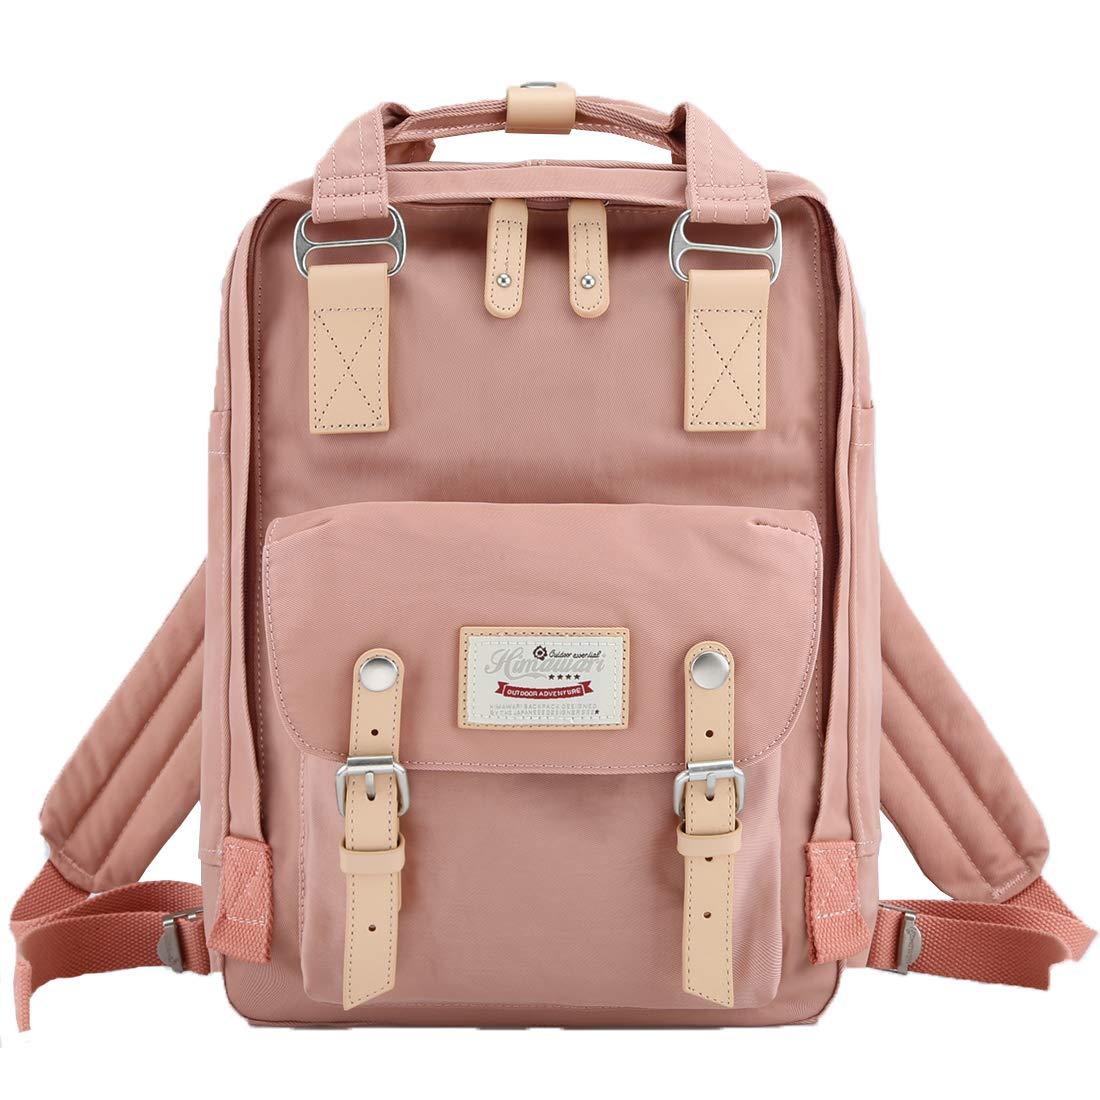 Himawari School Functional Travel Backpack for Women Waterproof 15 Inch Laptop Bag for College (HIM-23#) by himawari